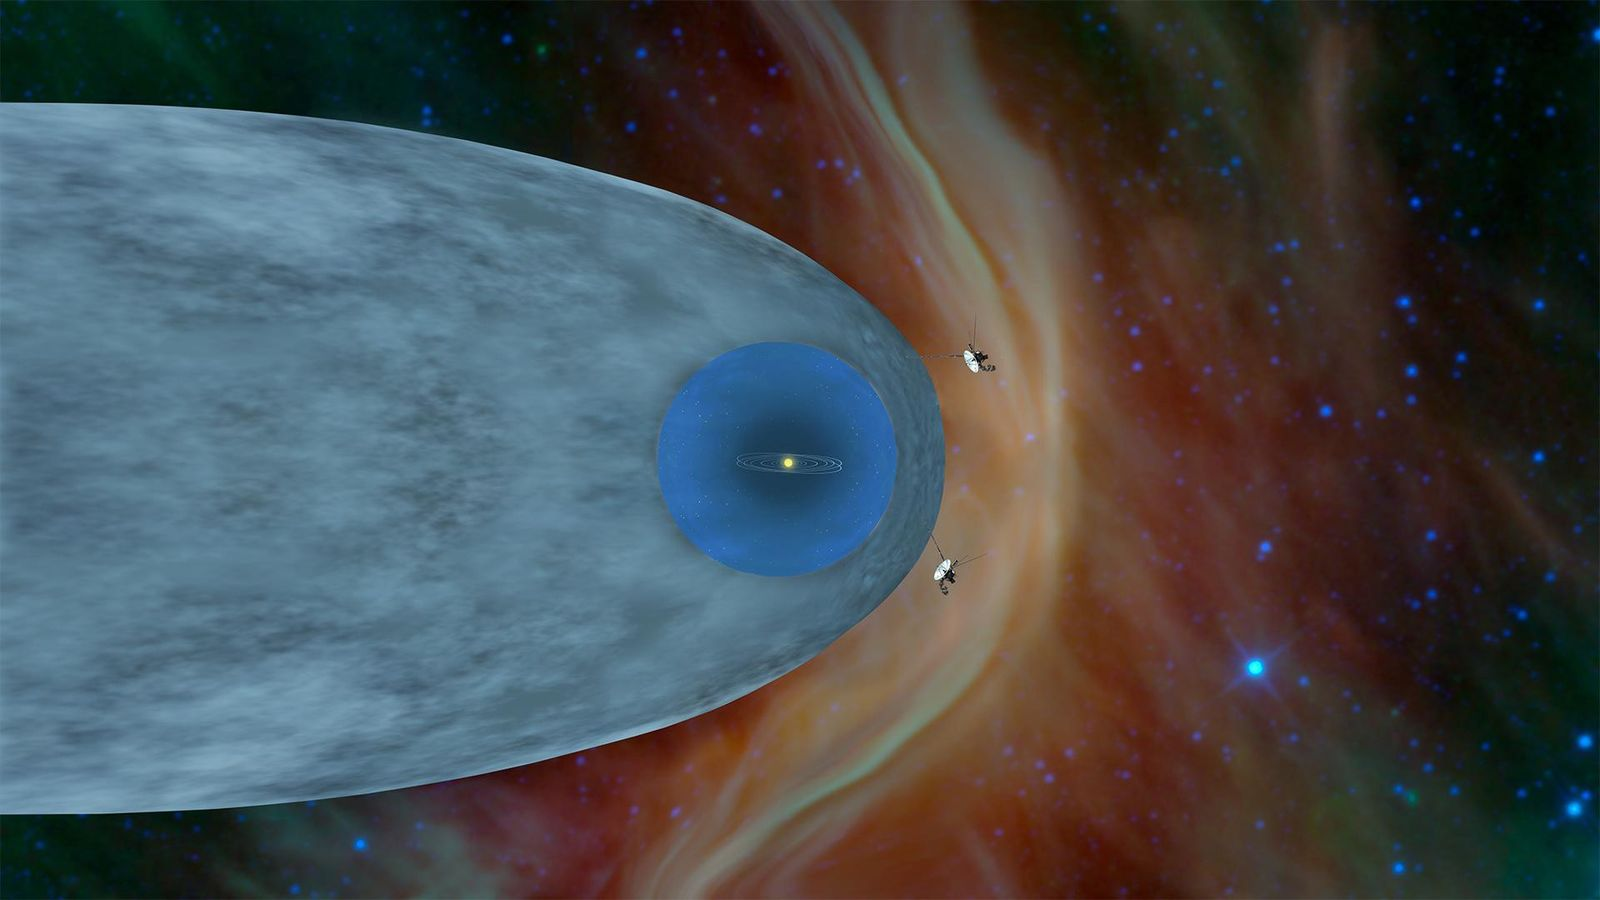 Interstellar space even weirder than expected, NASA probe reveals